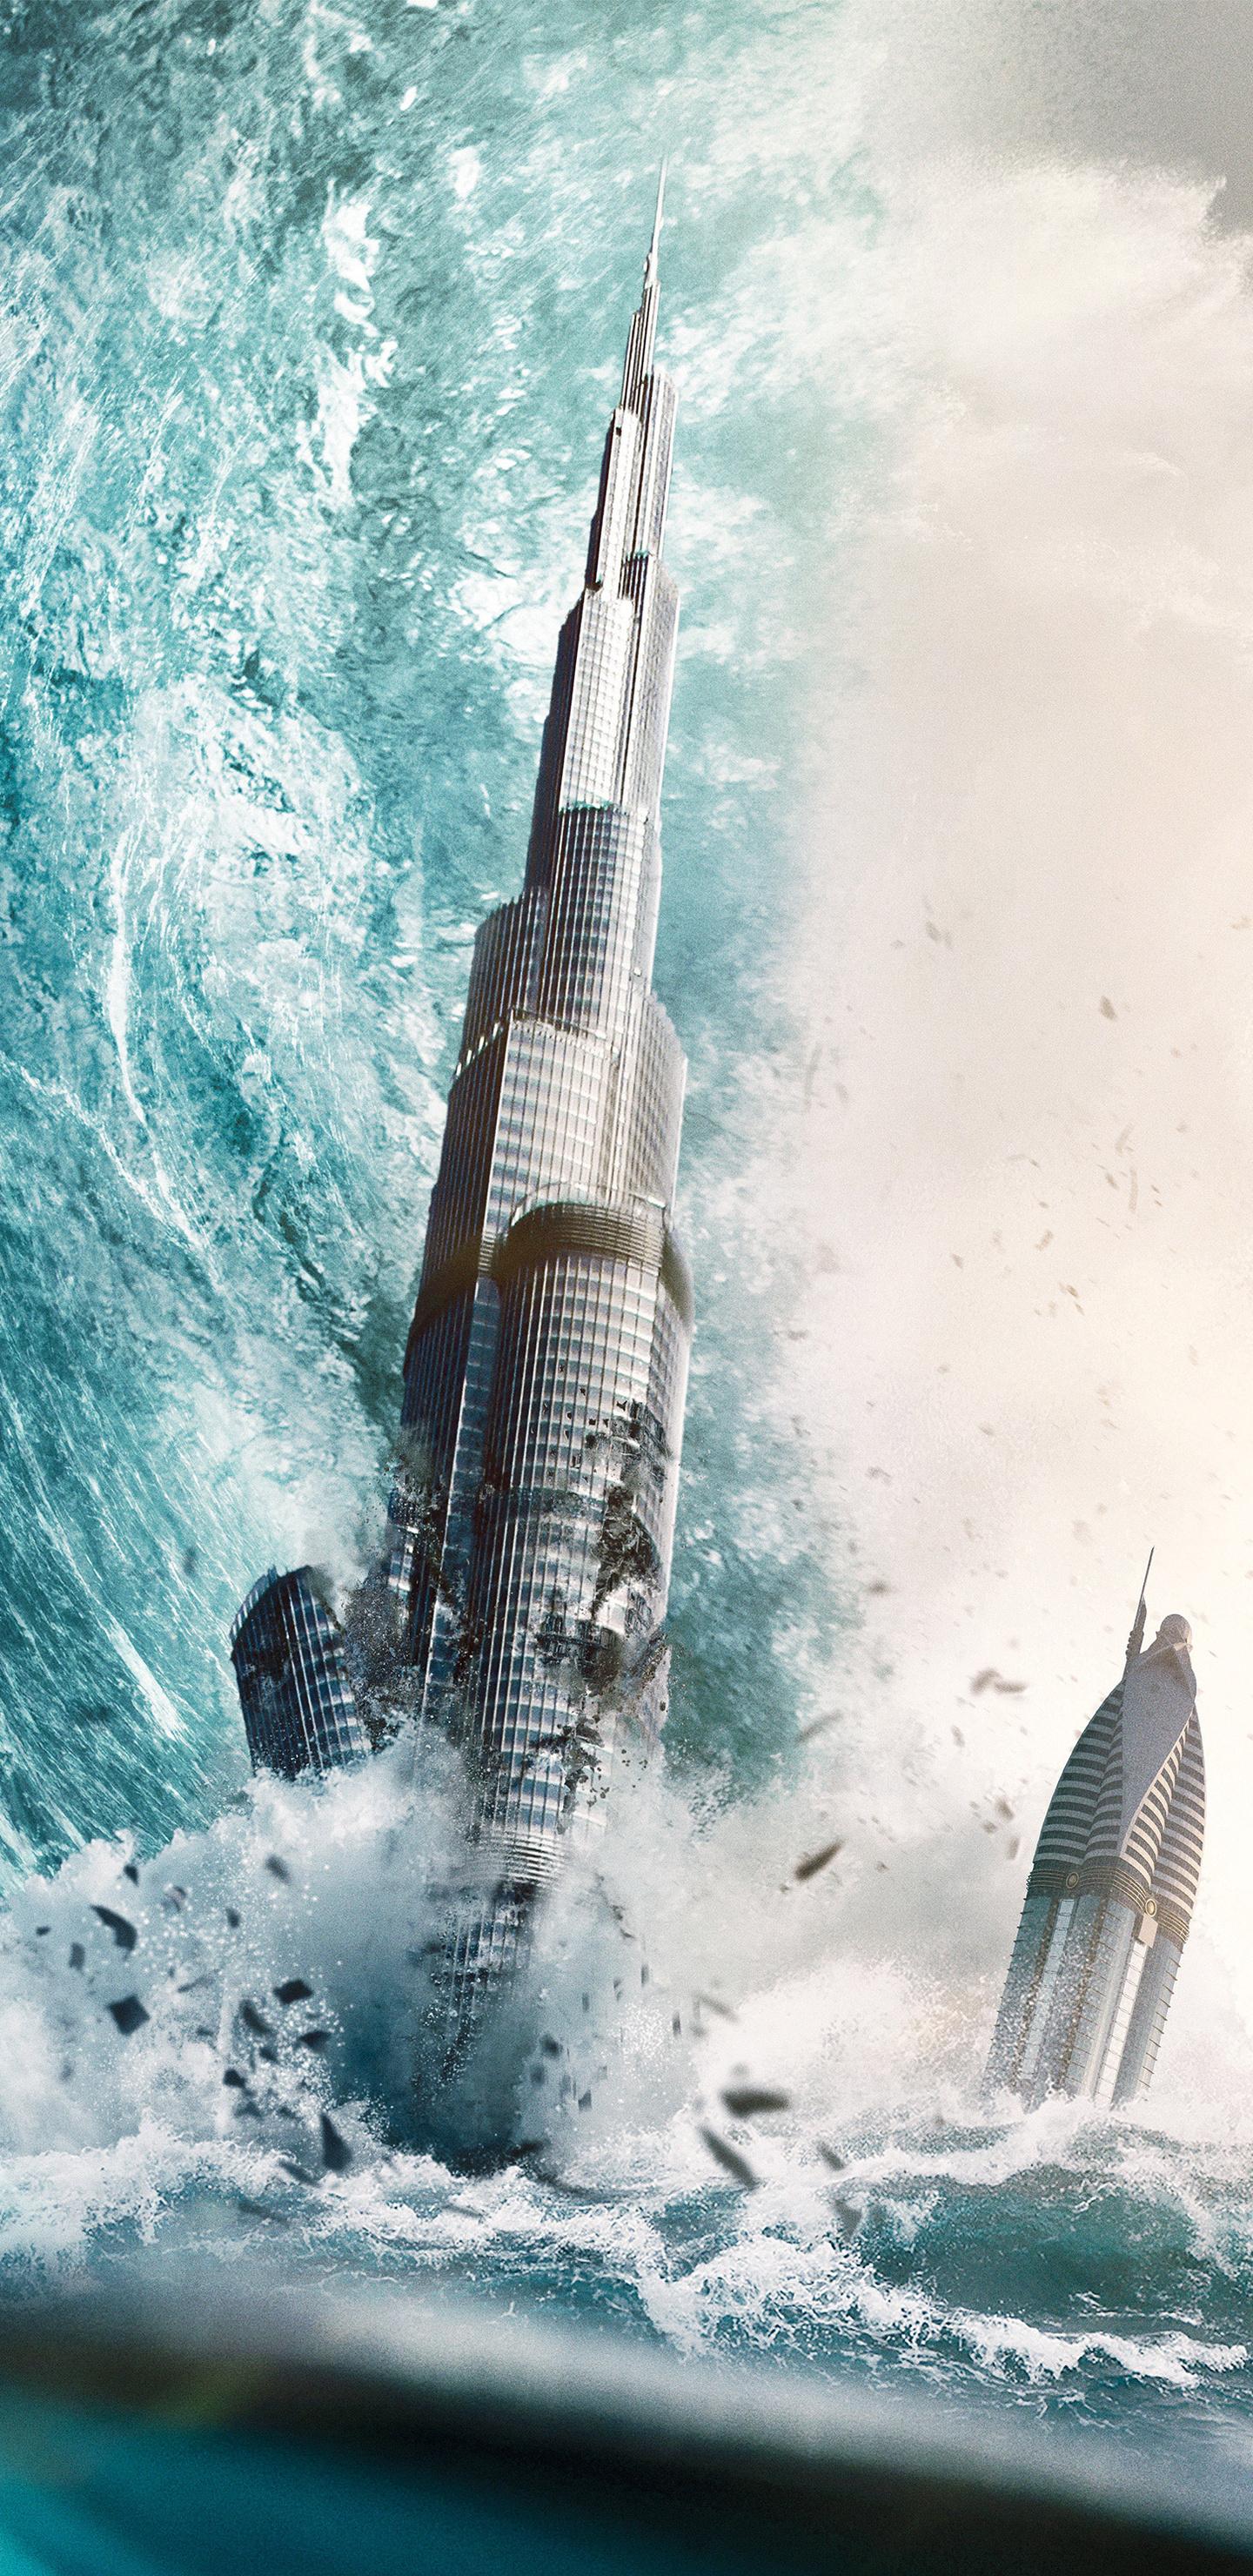 geostorm-2017-movie-4k-i1.jpg